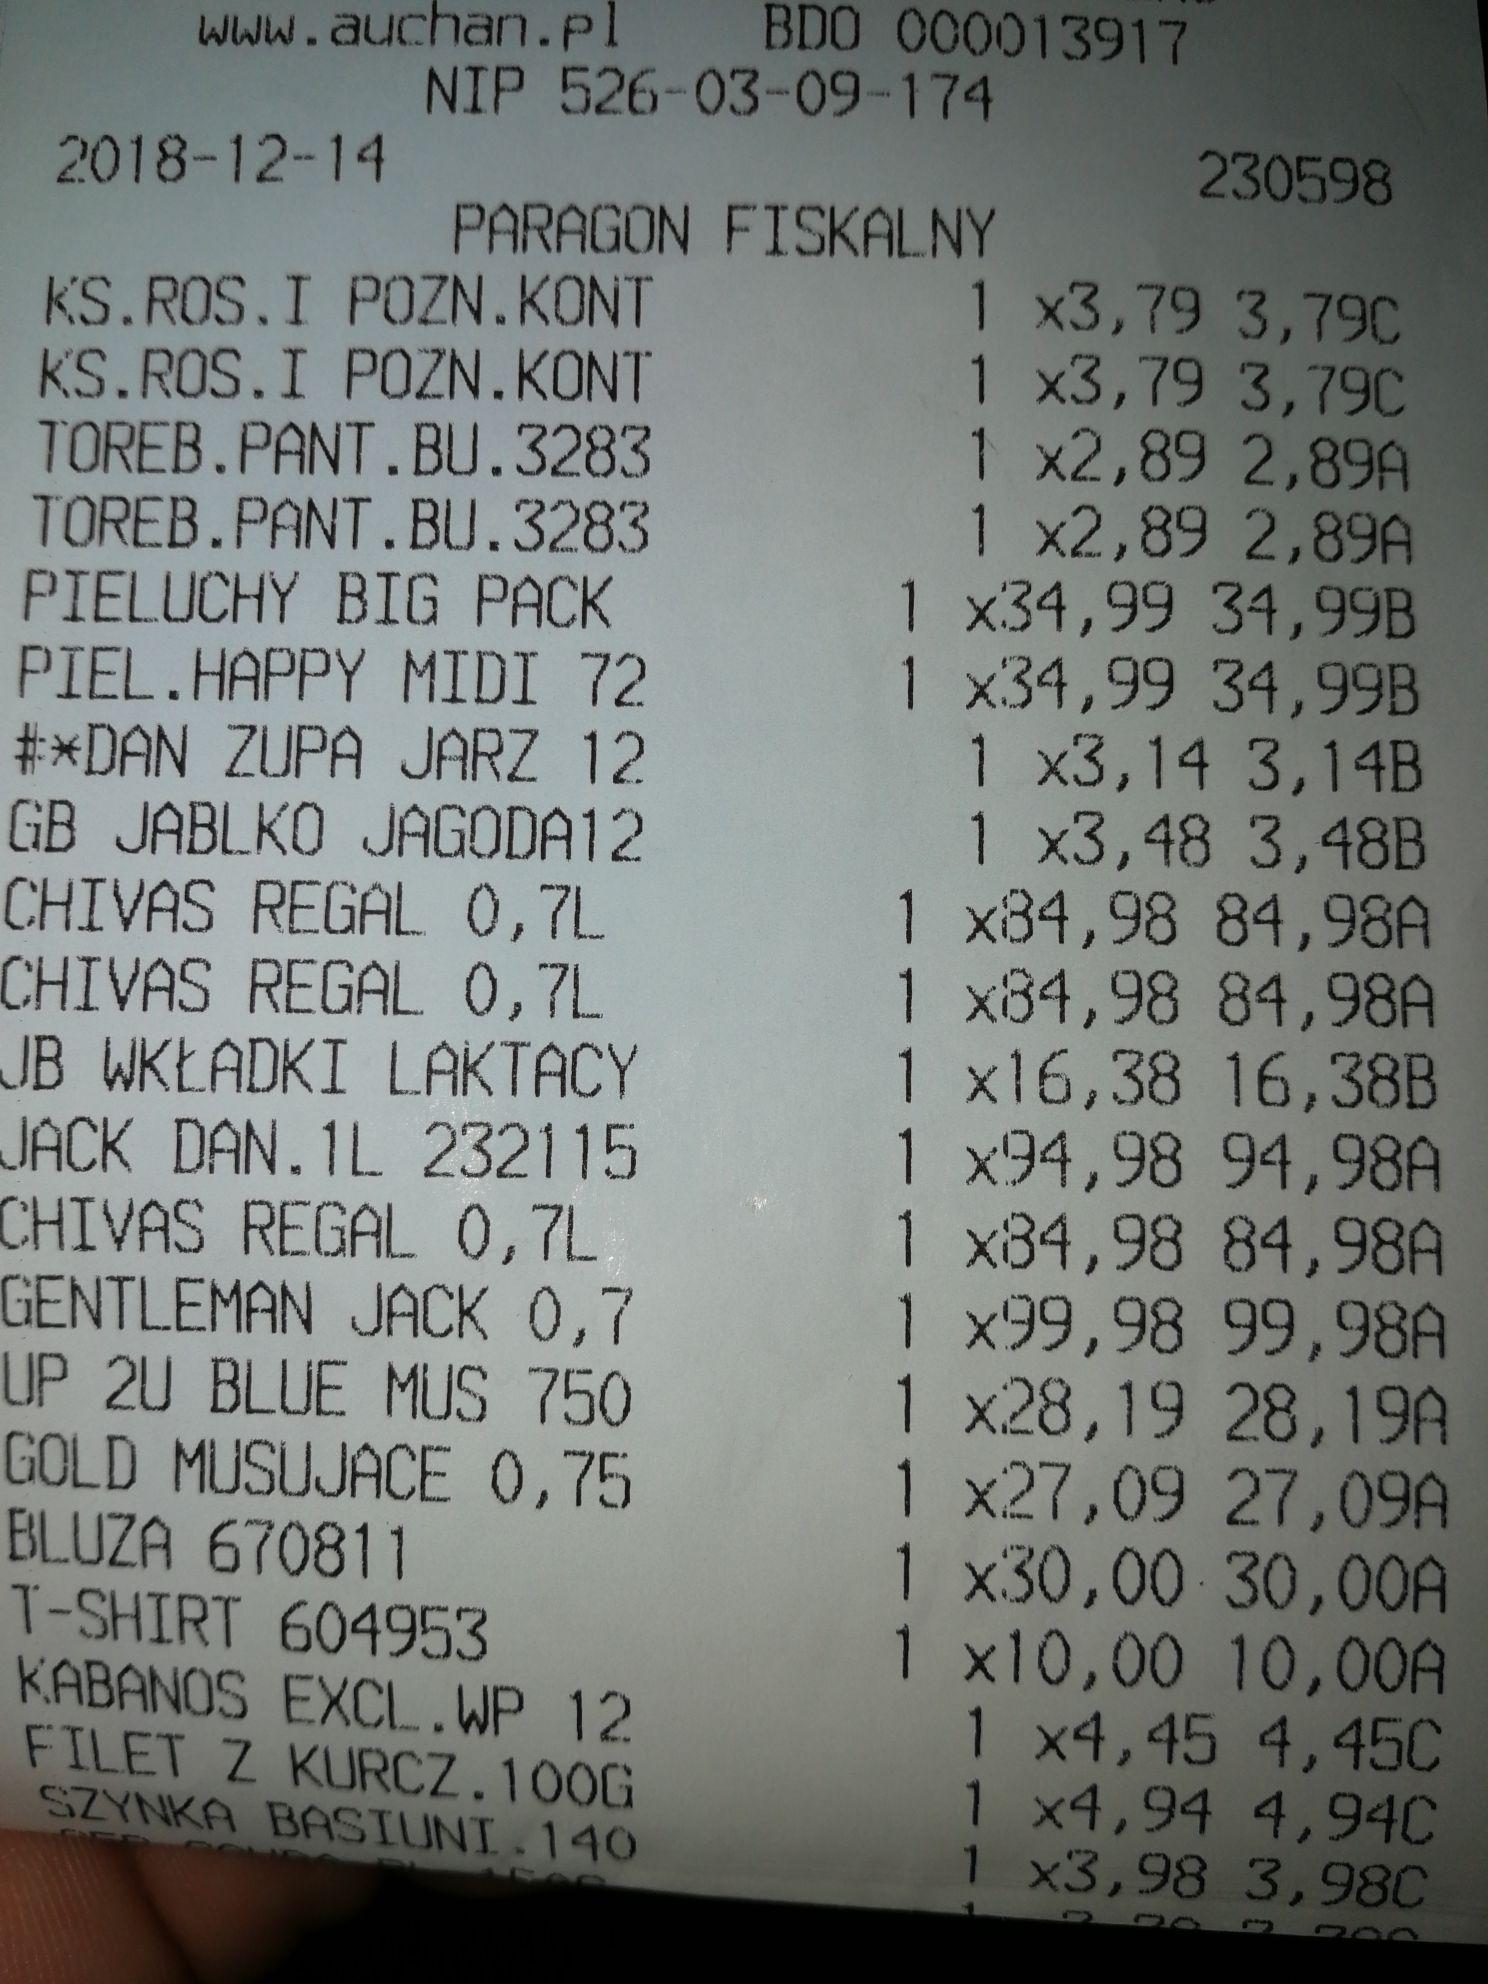 Chivas regal 12 0,7l + 2 szklanki @ Auchan